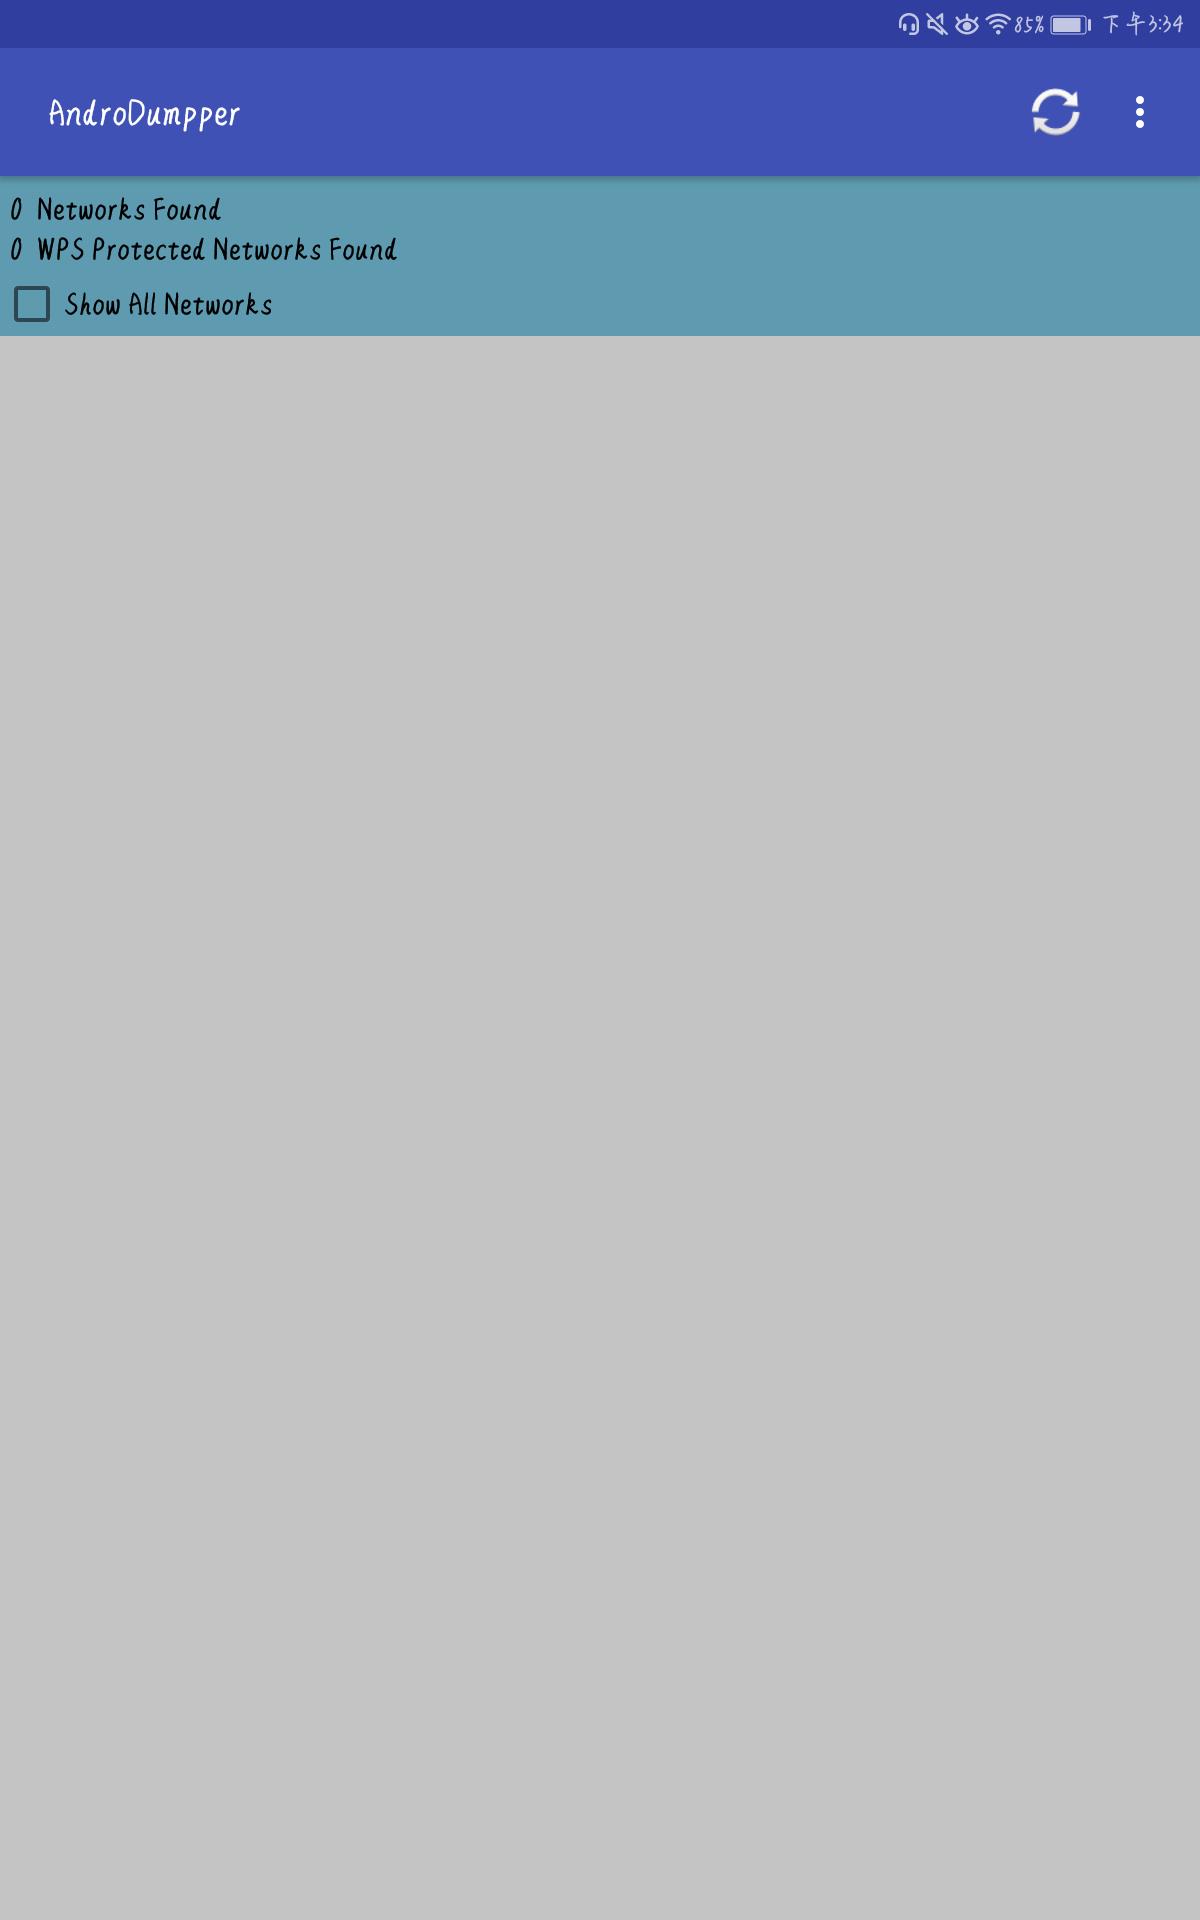 【考核】Andro Dumpper WiFi密码破解